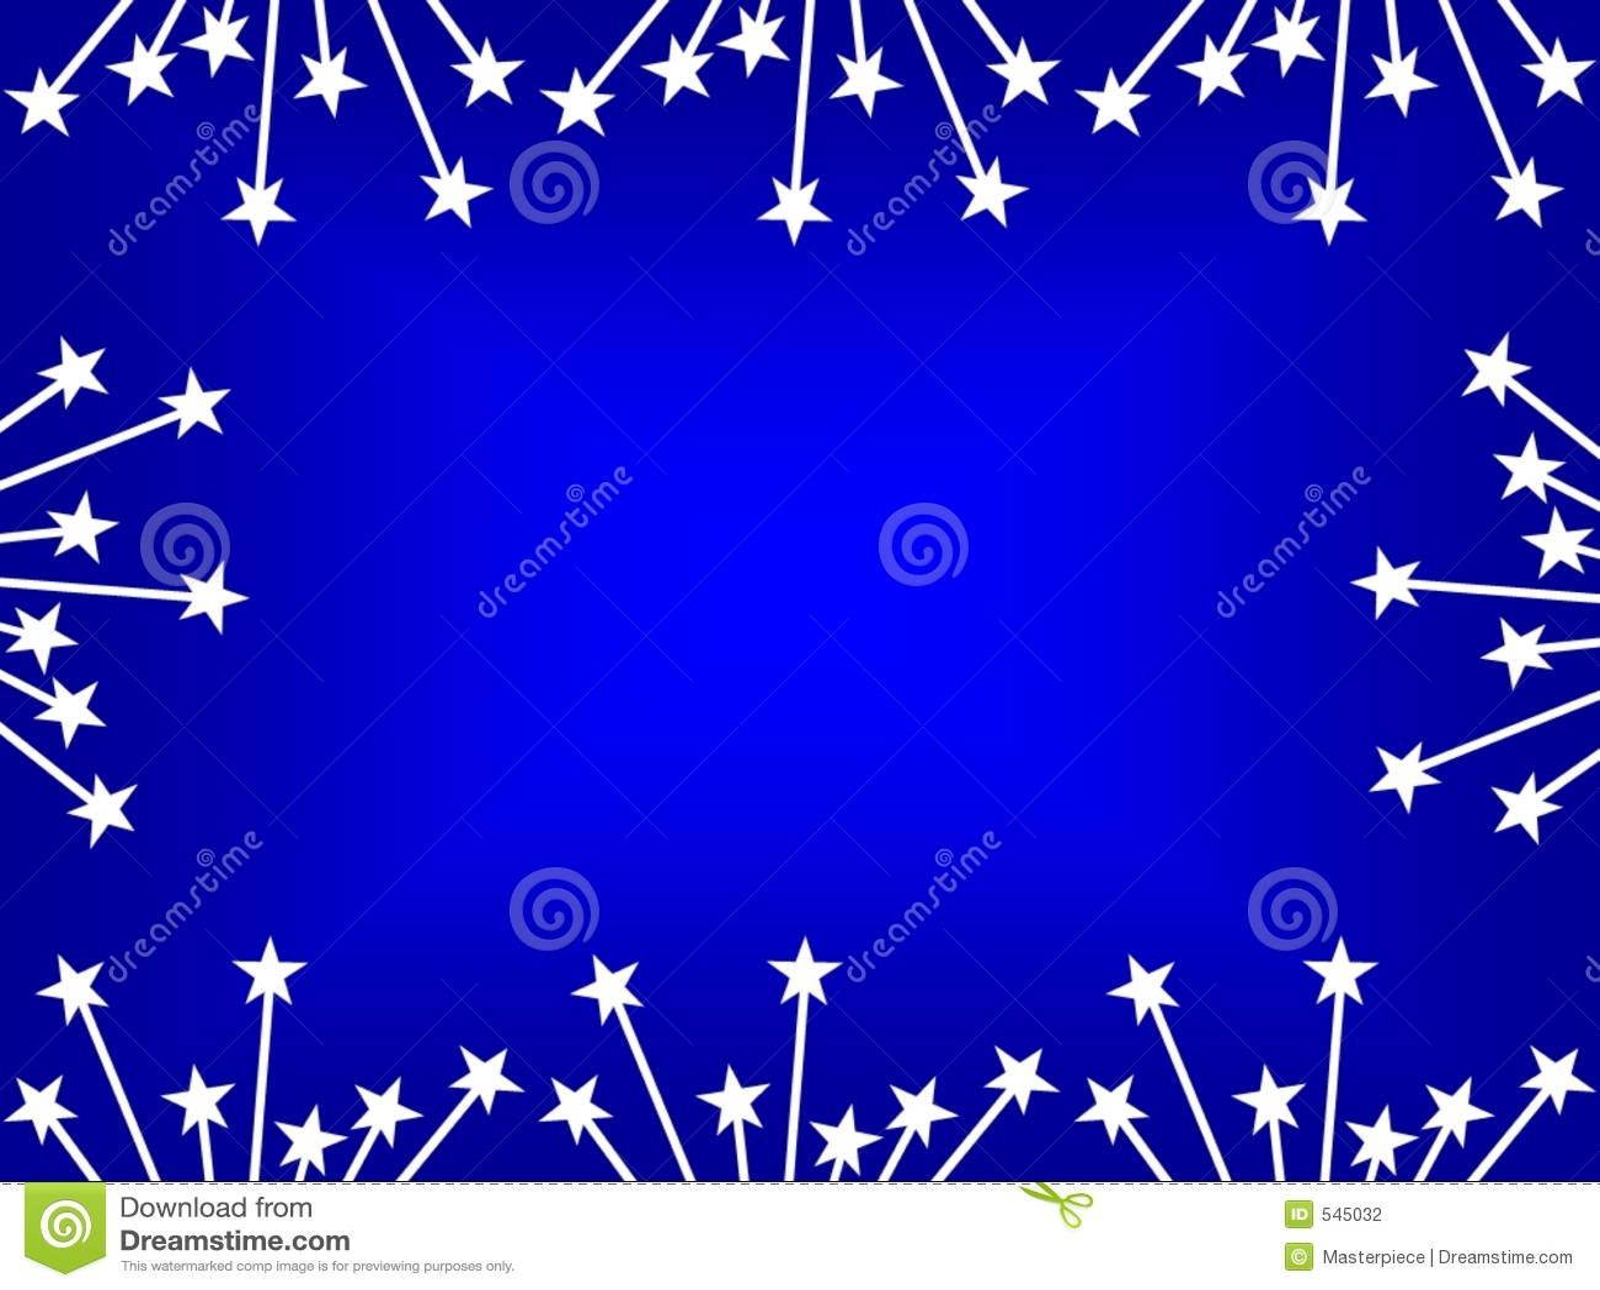 Download 边界冷静壁角花雪星形冬天 库存例证. 插画 包括有 例证, 背包, 星形, 剪影, 问候, 本质, 抽象, 看板卡 - 545032